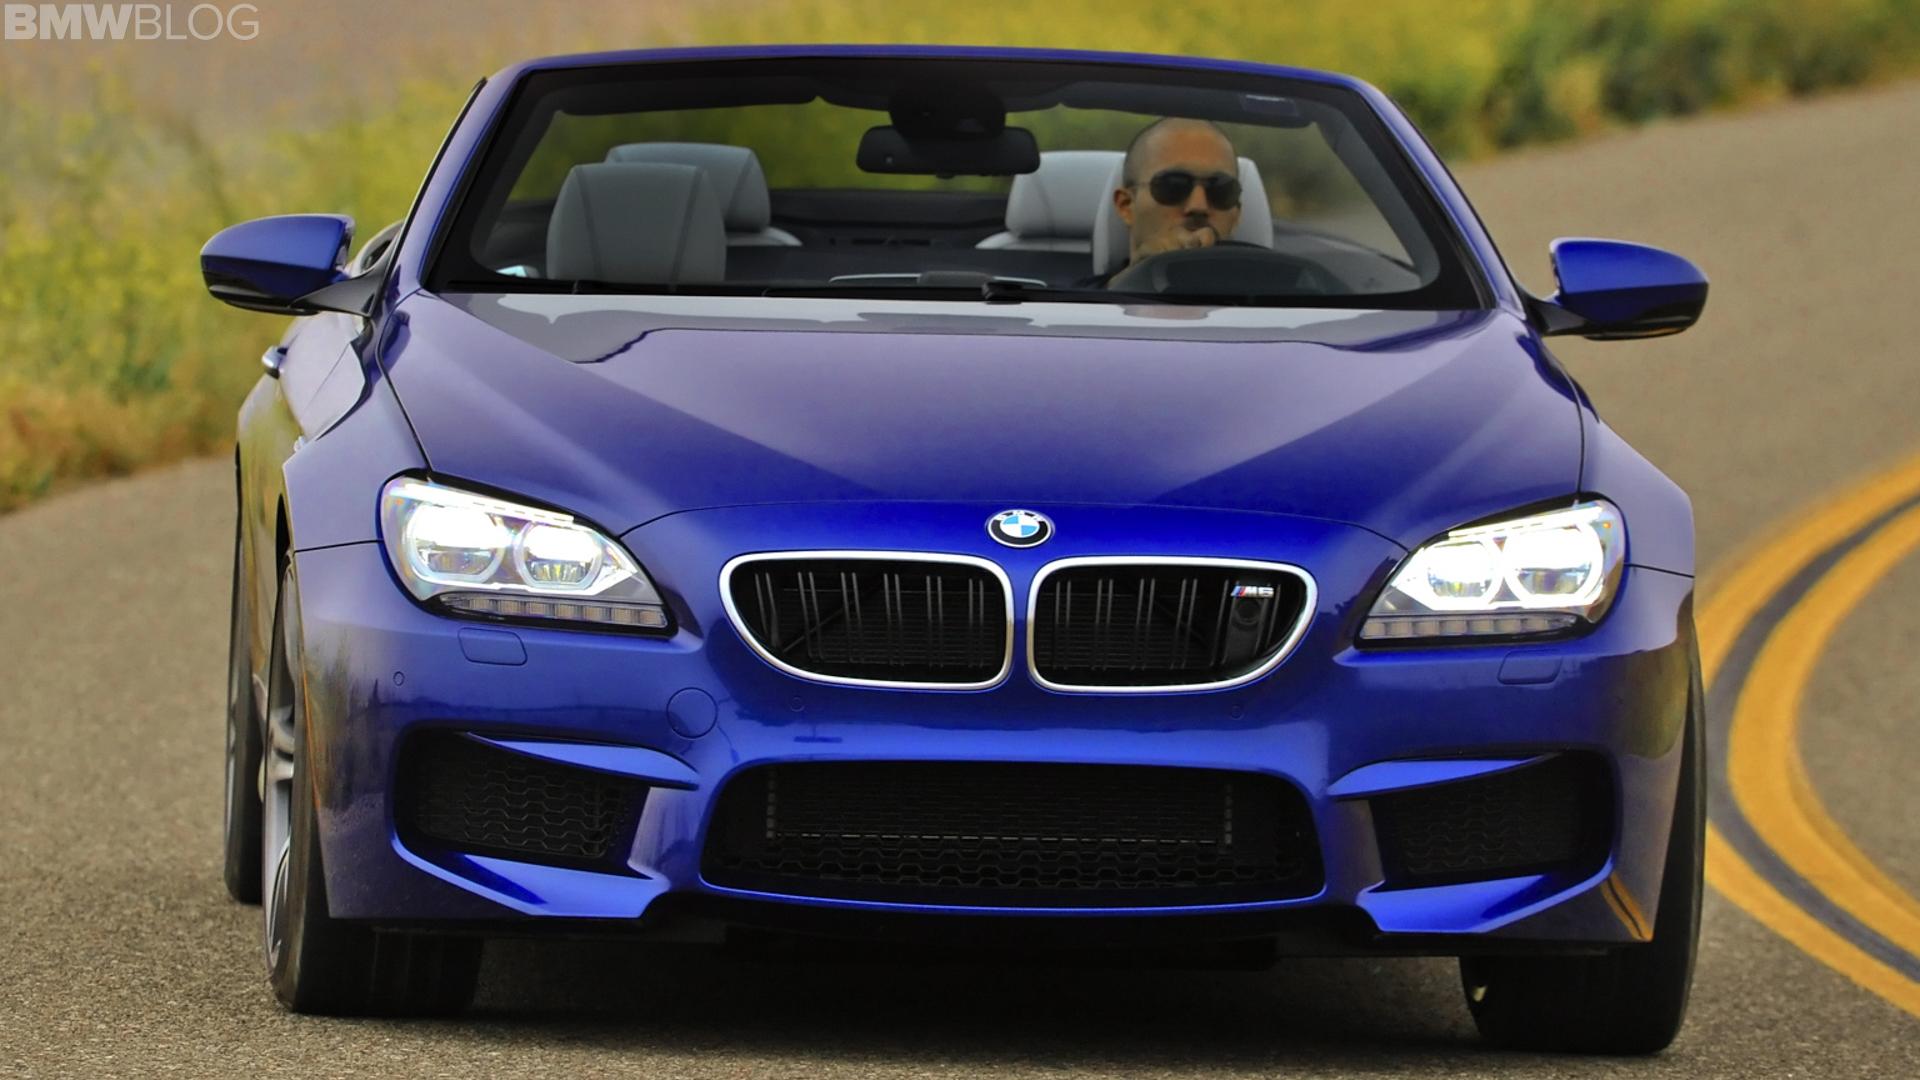 BMW M8 Convertible vs BMW M6 Convertible 4 of 16